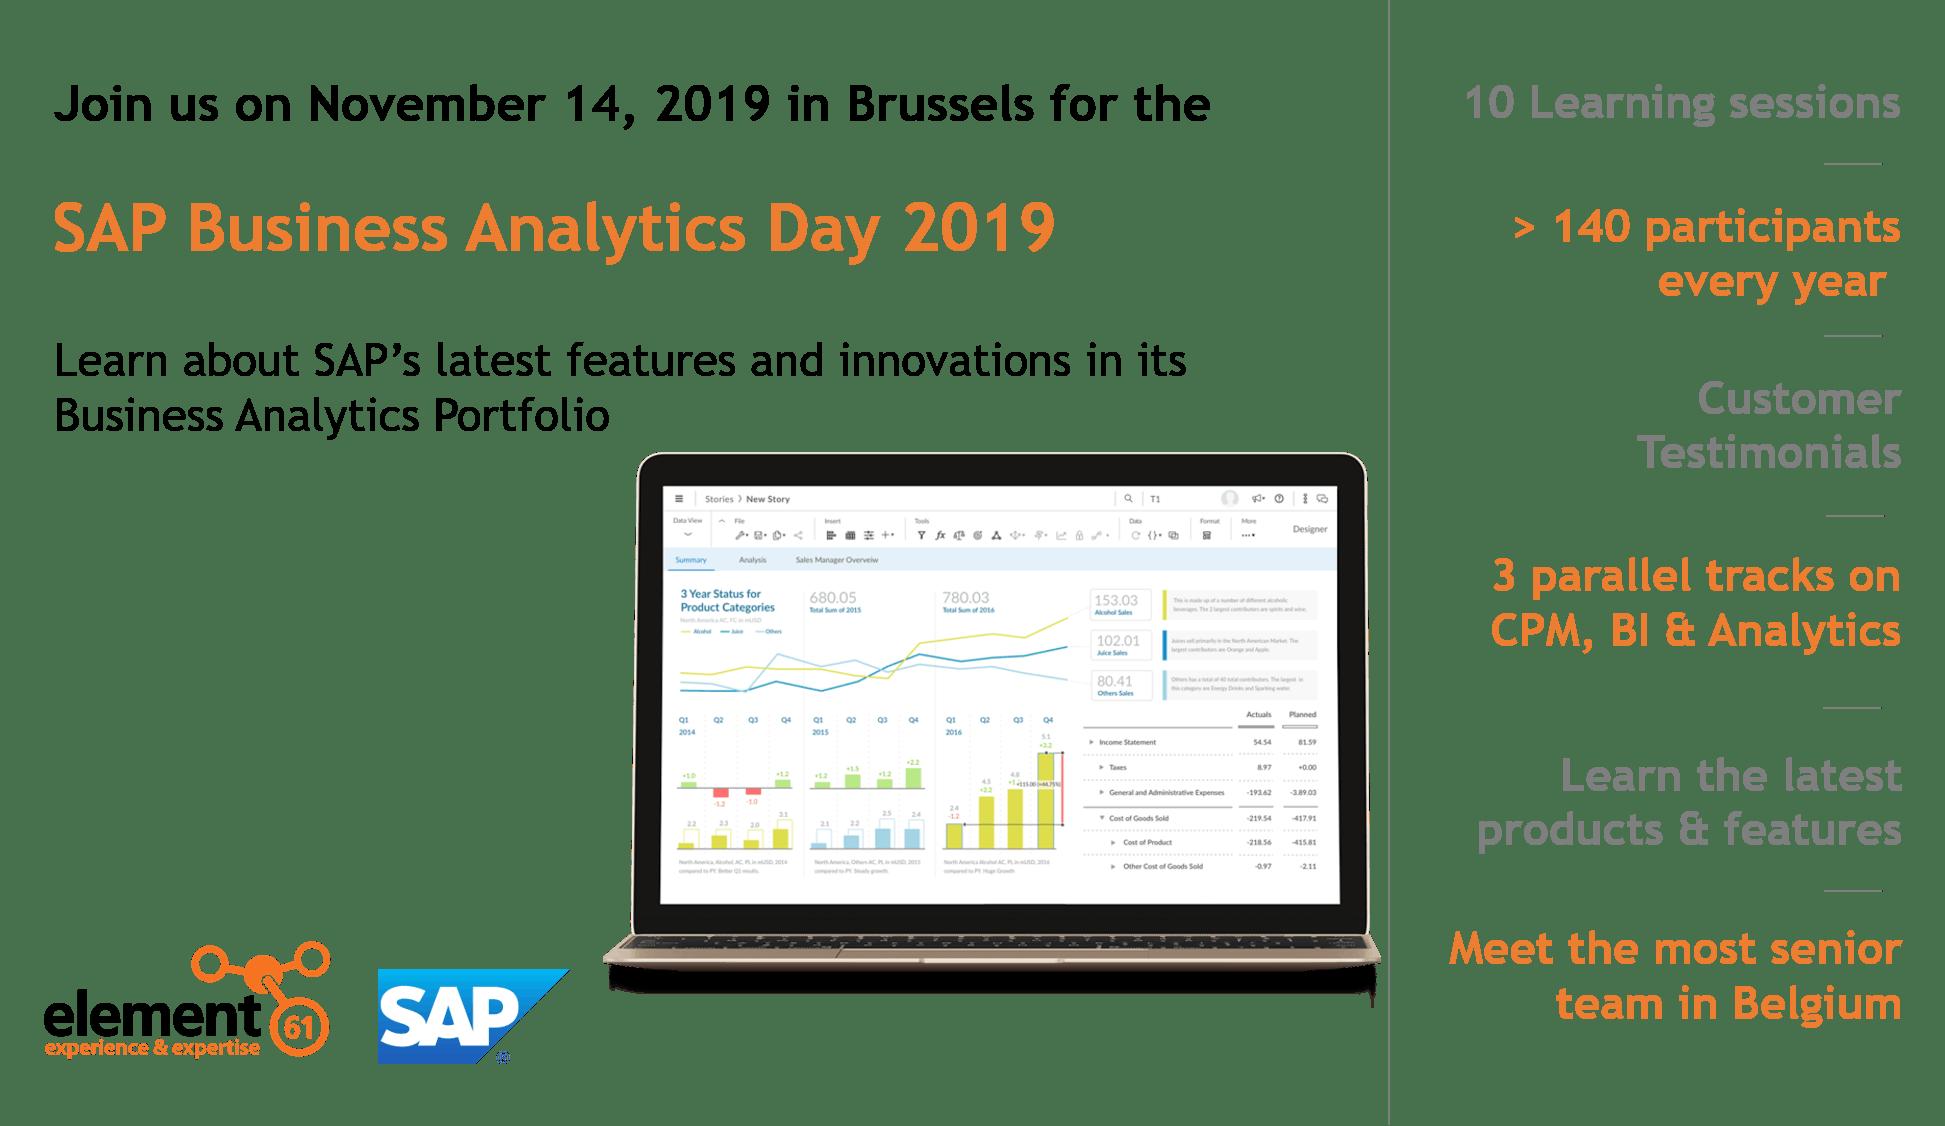 SAP Business Analytics Day 2019